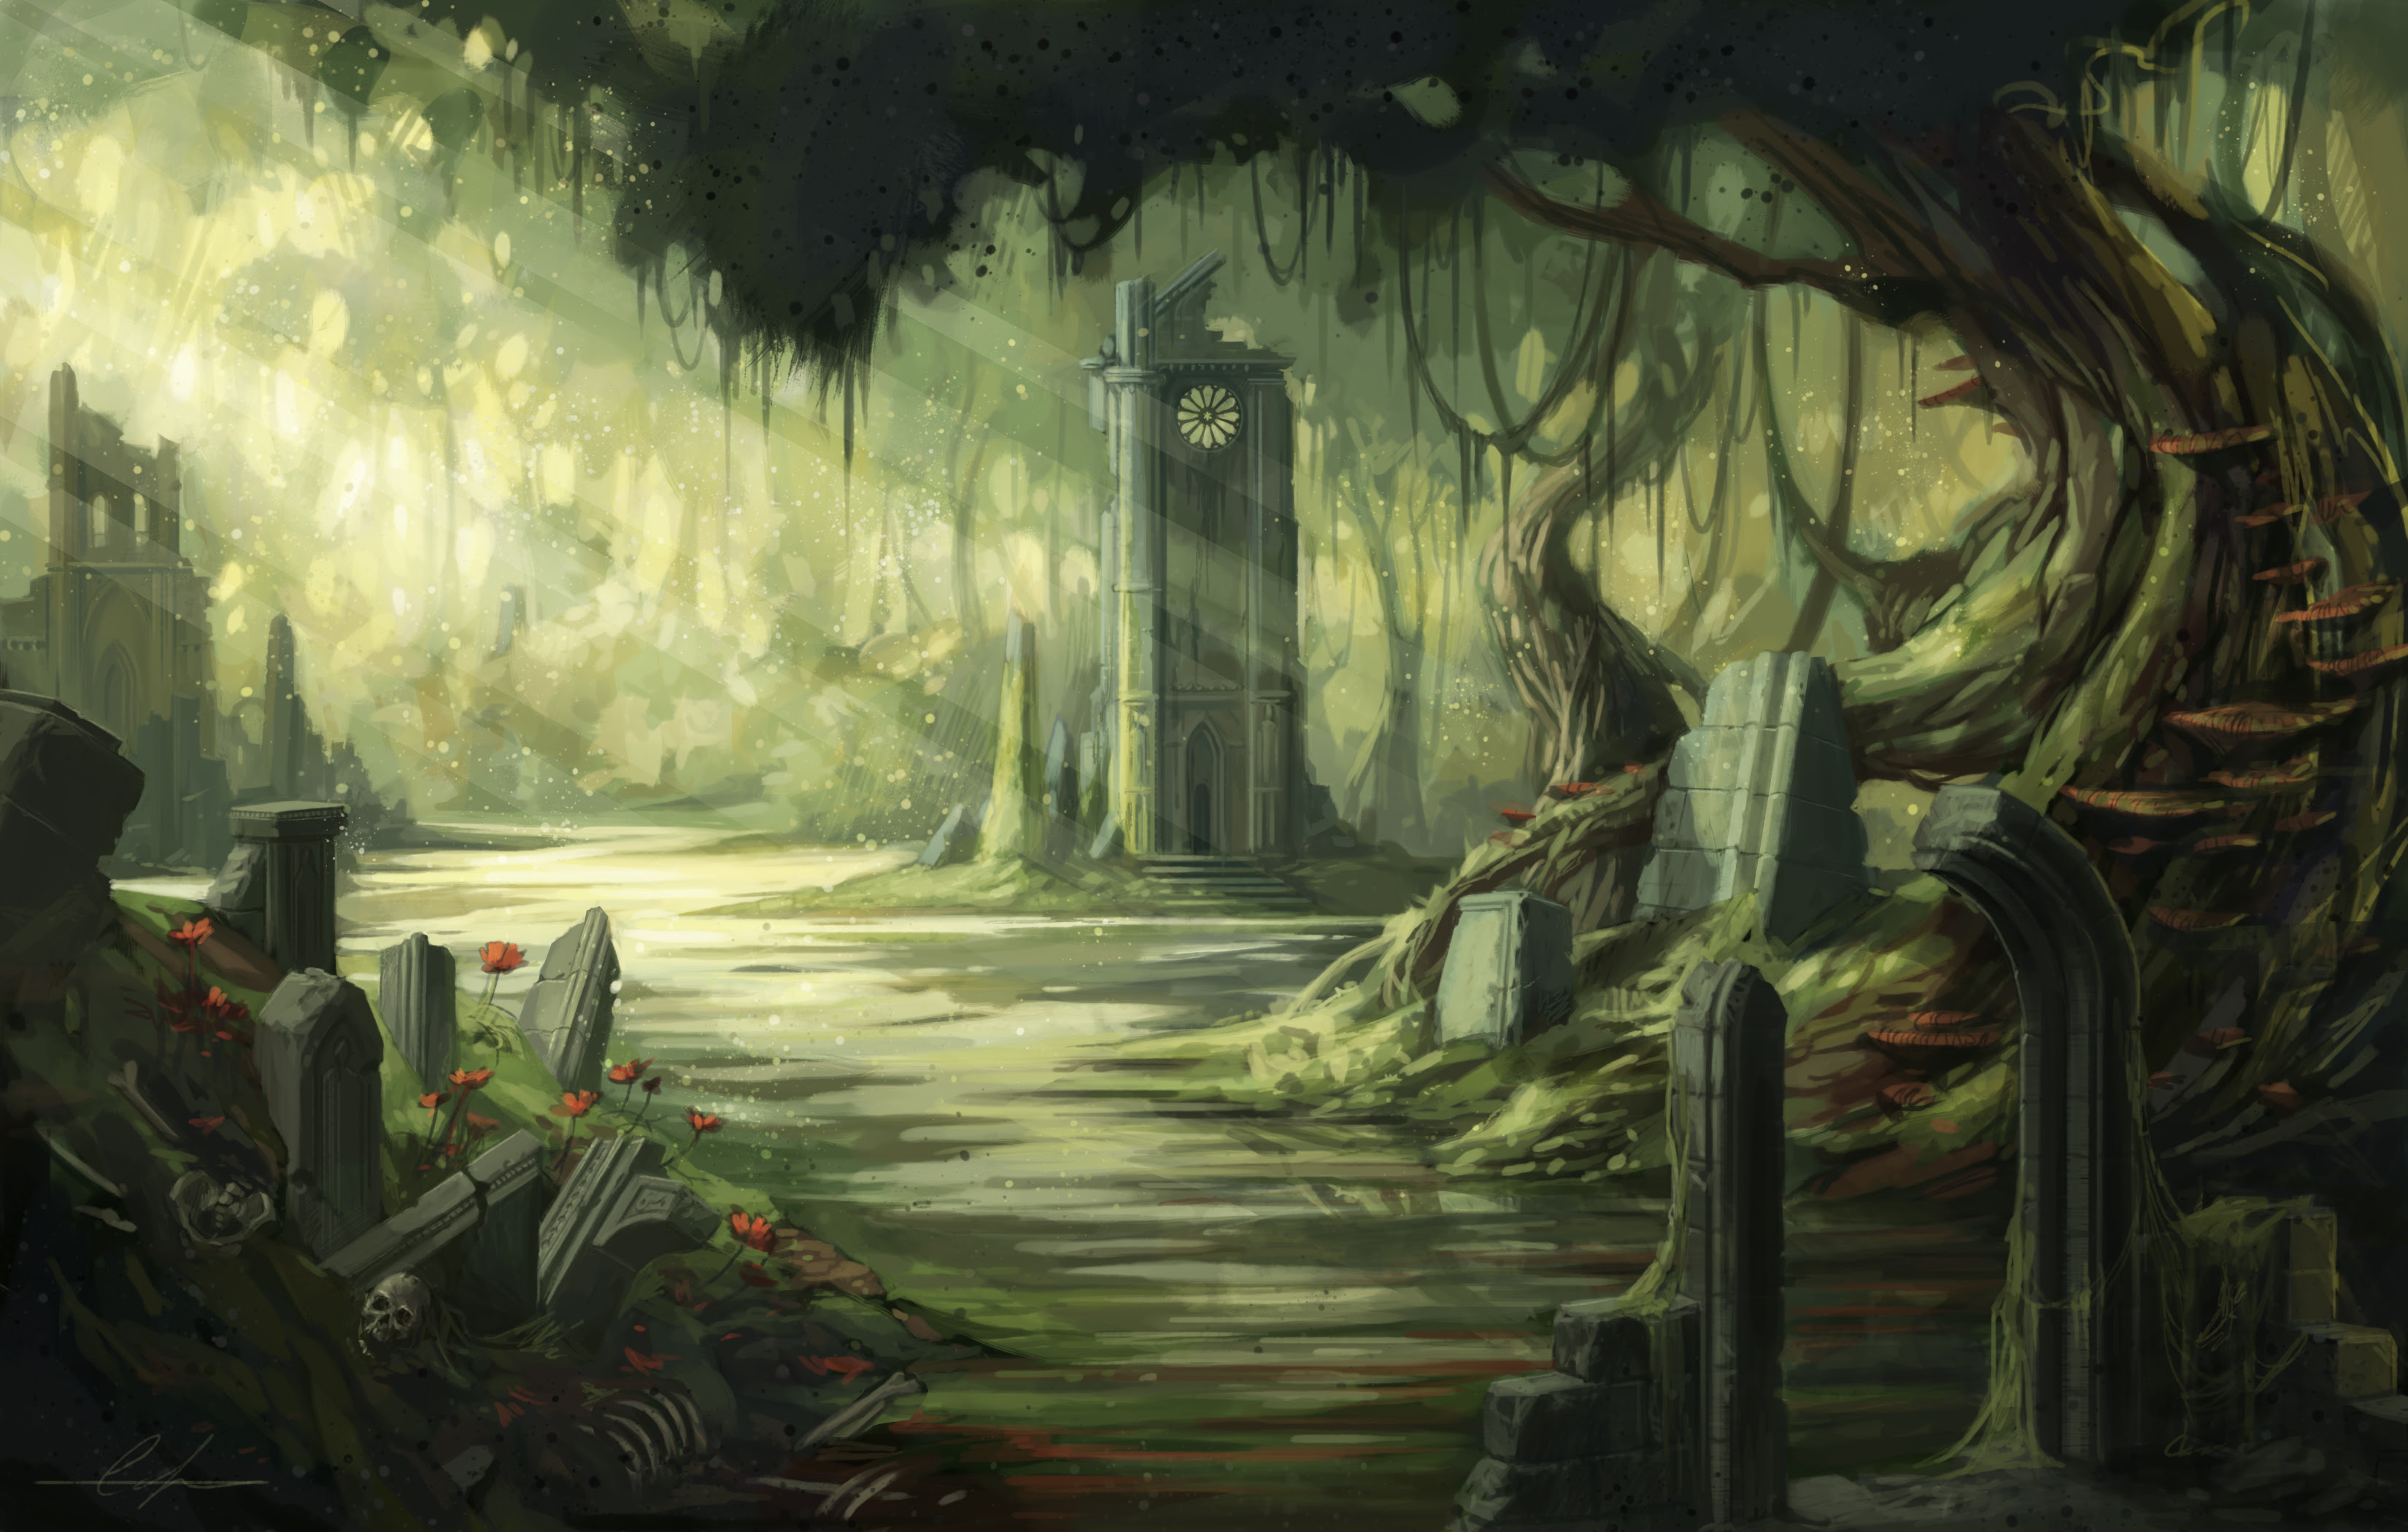 http://fc01.deviantart.net/fs71/f/2010/308/d/2/swamp_ruins_by_snaketoast-d32675n.jpg